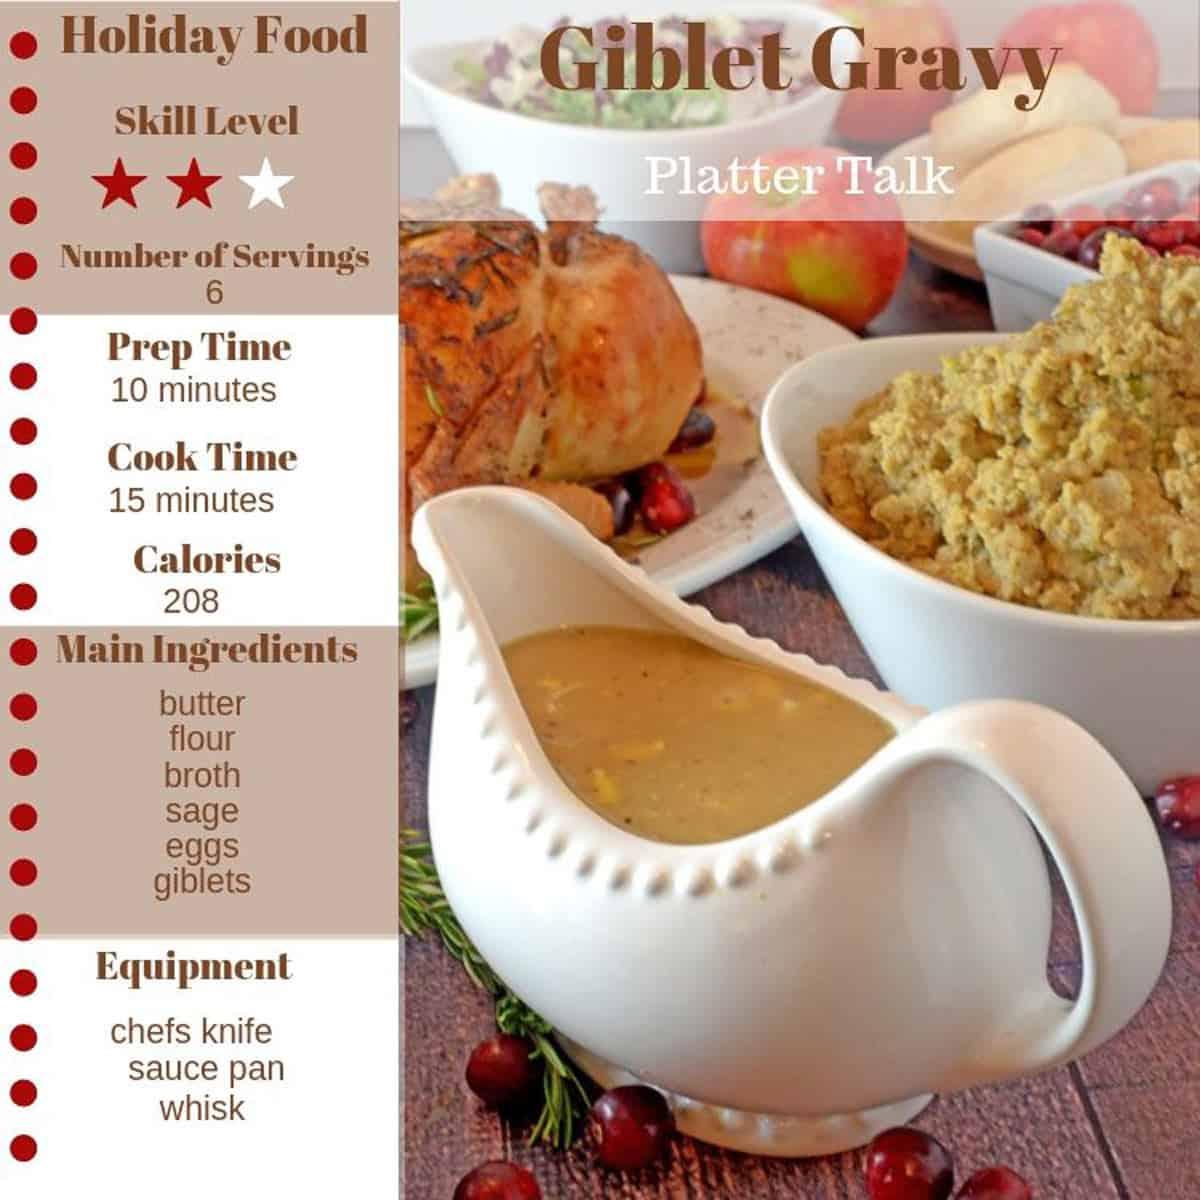 Giblet Gravy Platter Talk